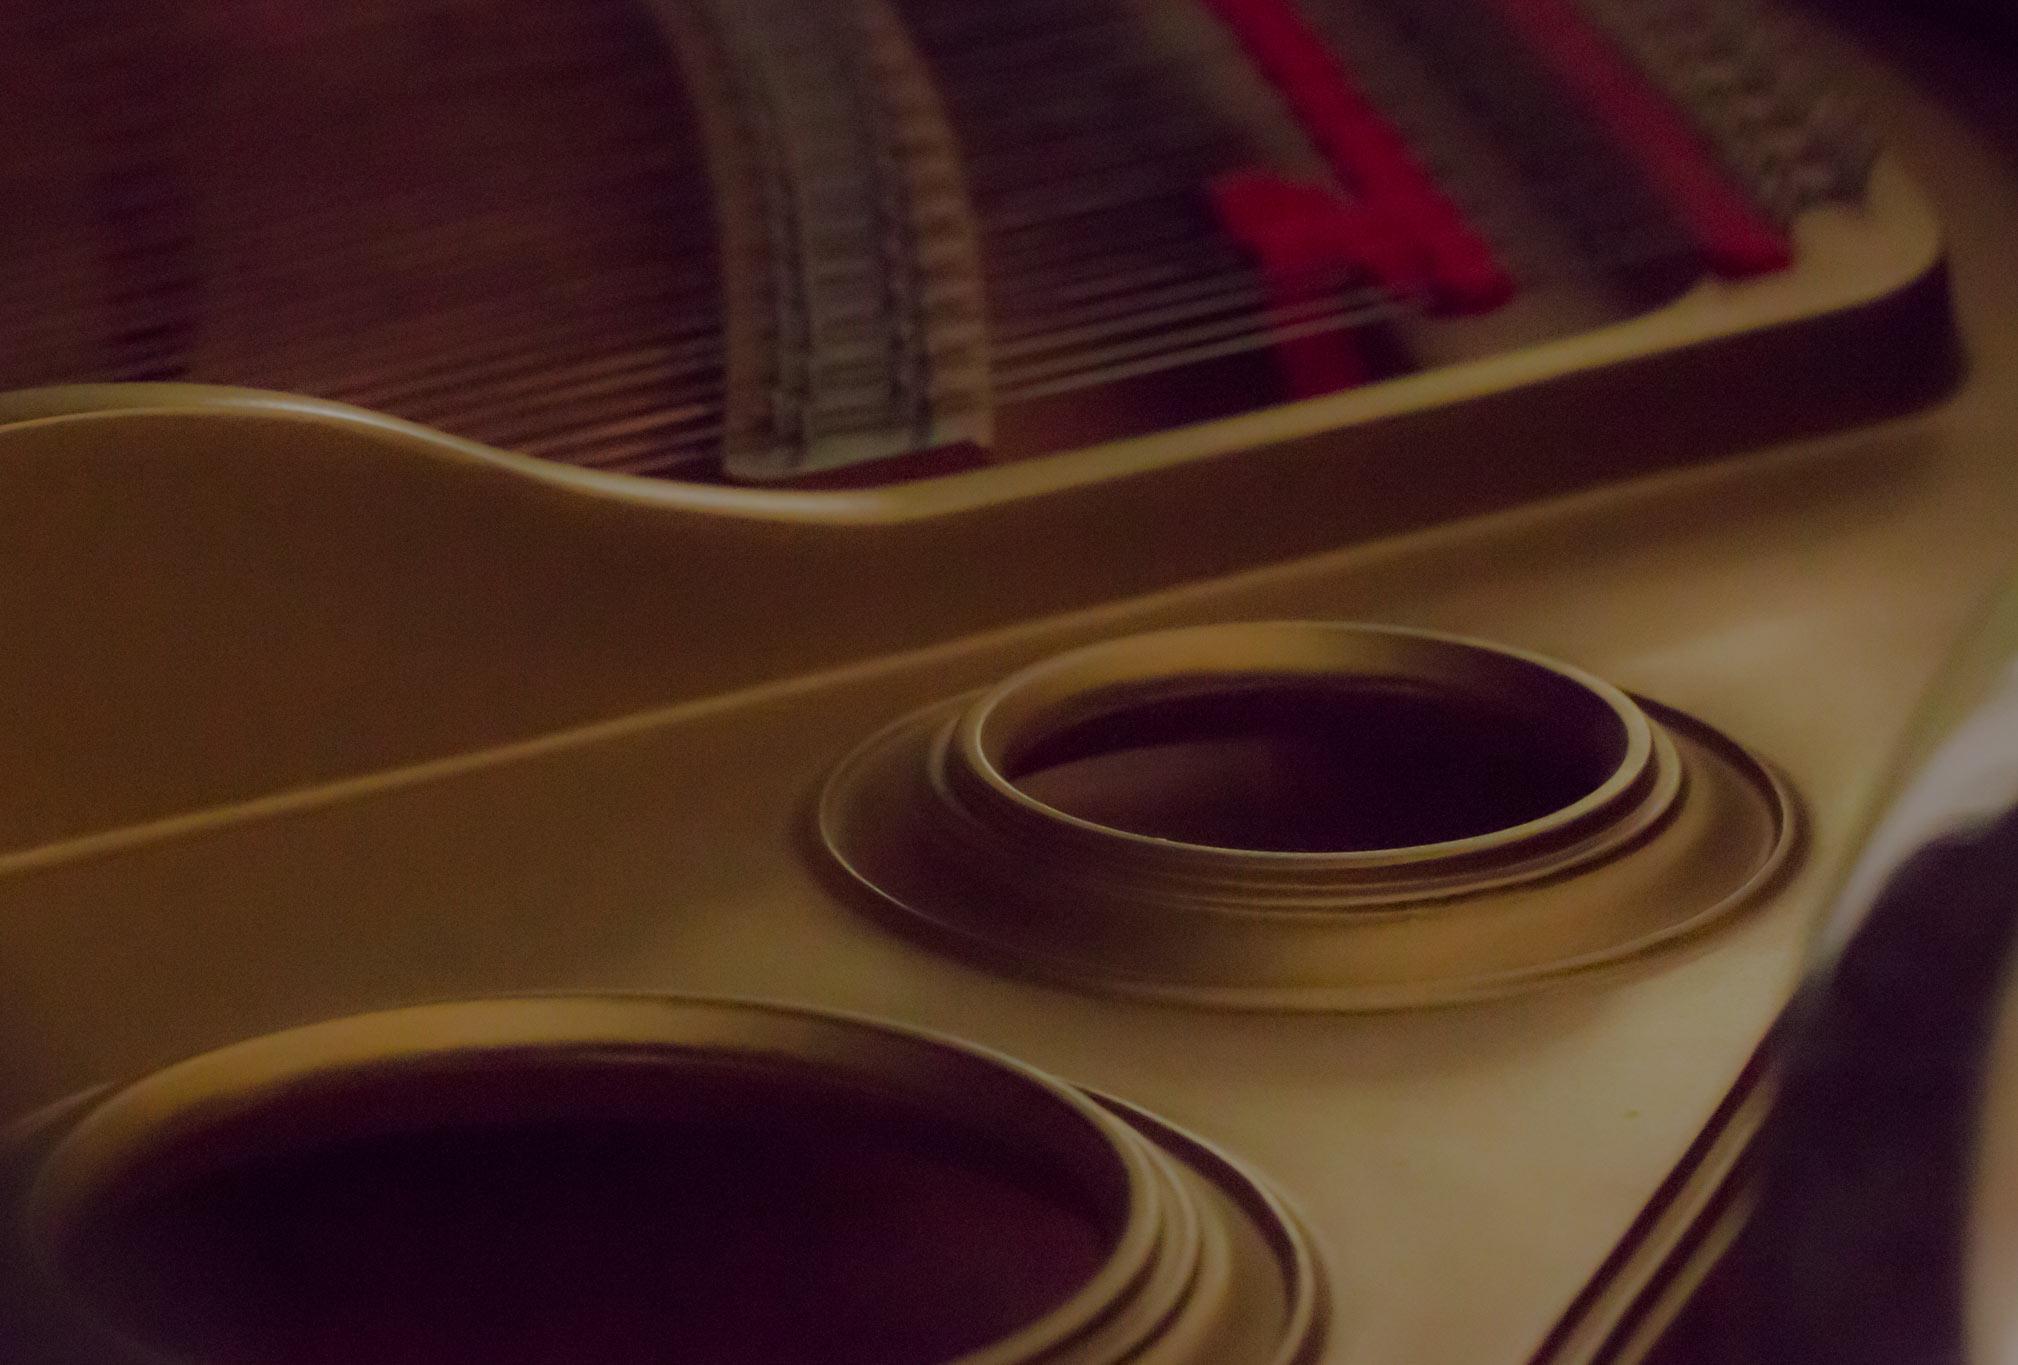 close up of piano strings